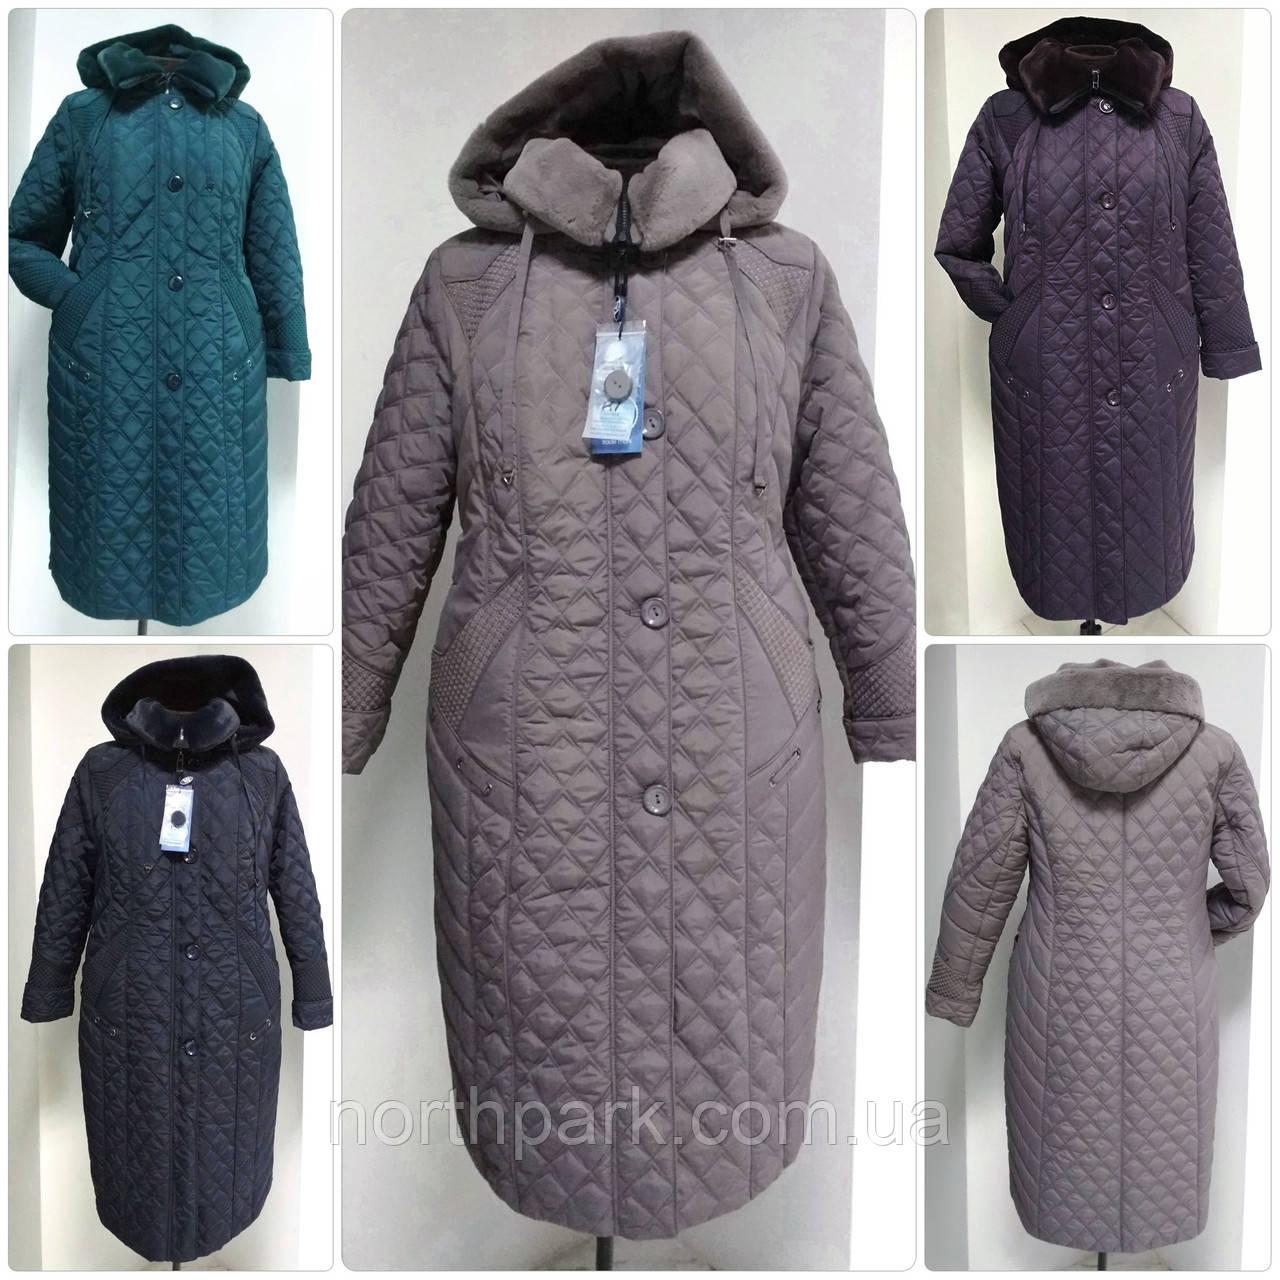 Зимове жіноче приталене стеганное пальто, баталл VS 157